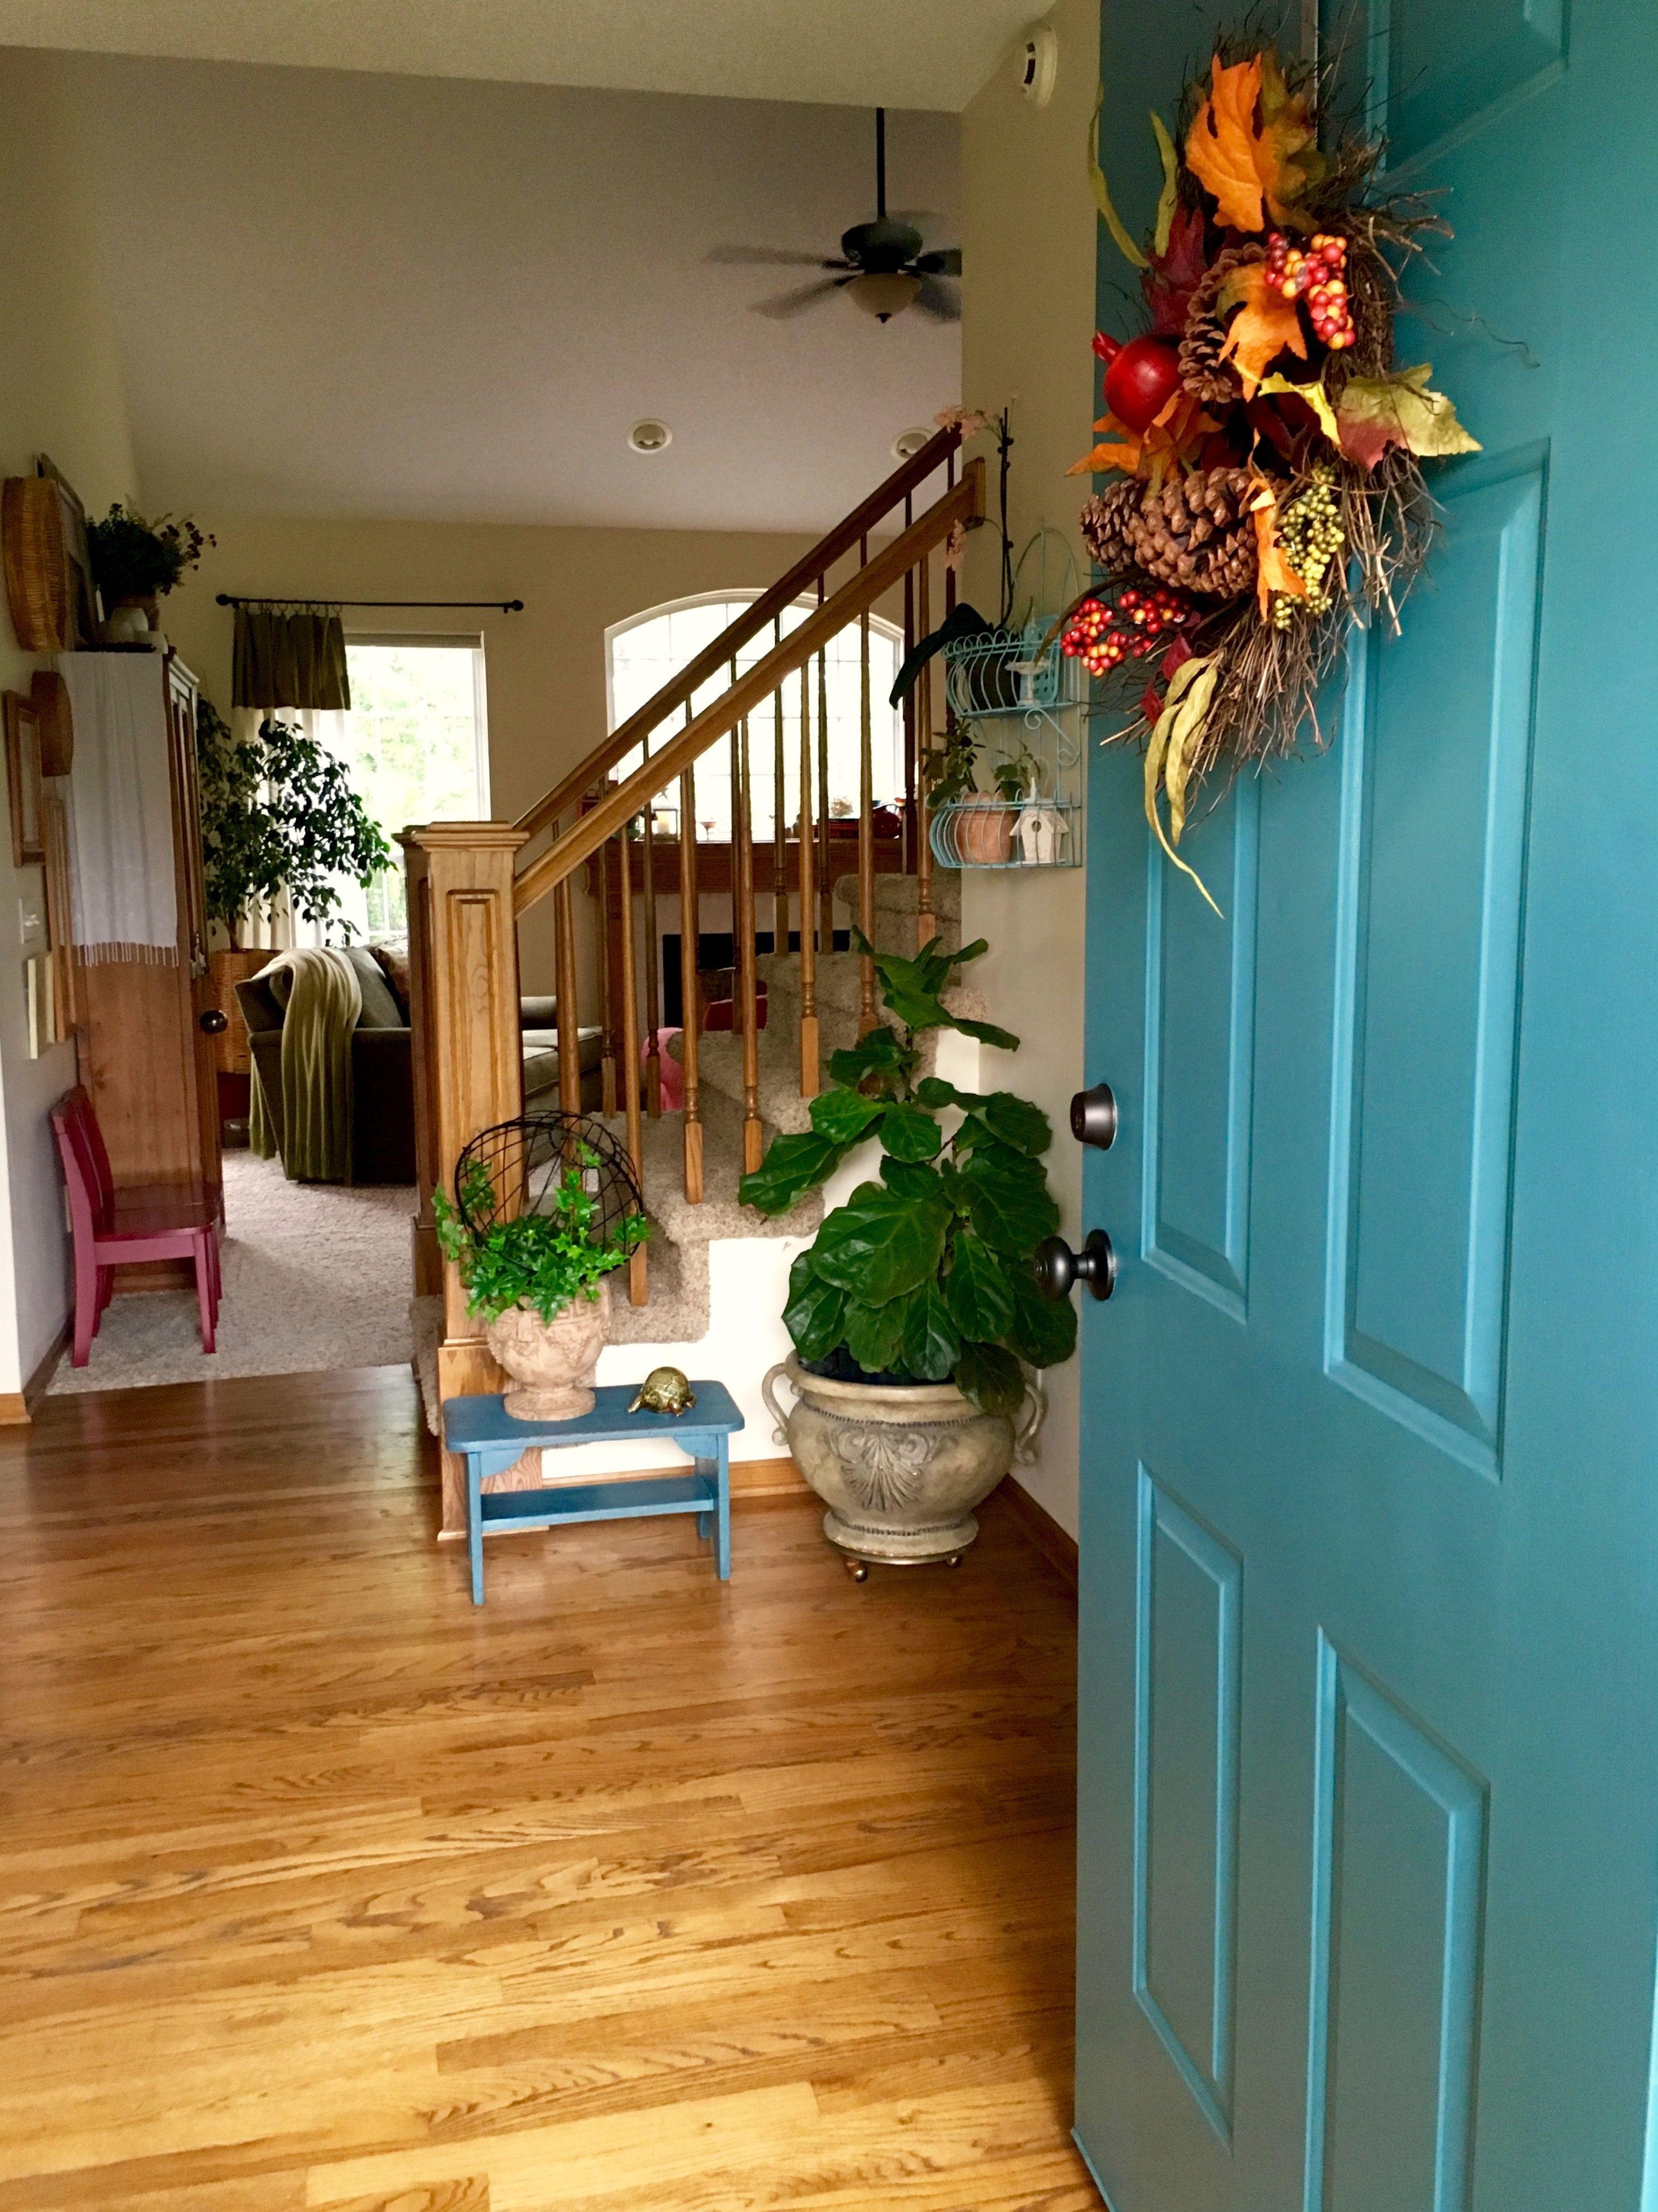 Fall door Paint is Valspar Medallion Concerto. & Fall door: Paint is Valspar Medallion Concerto. | Colors for ... pezcame.com